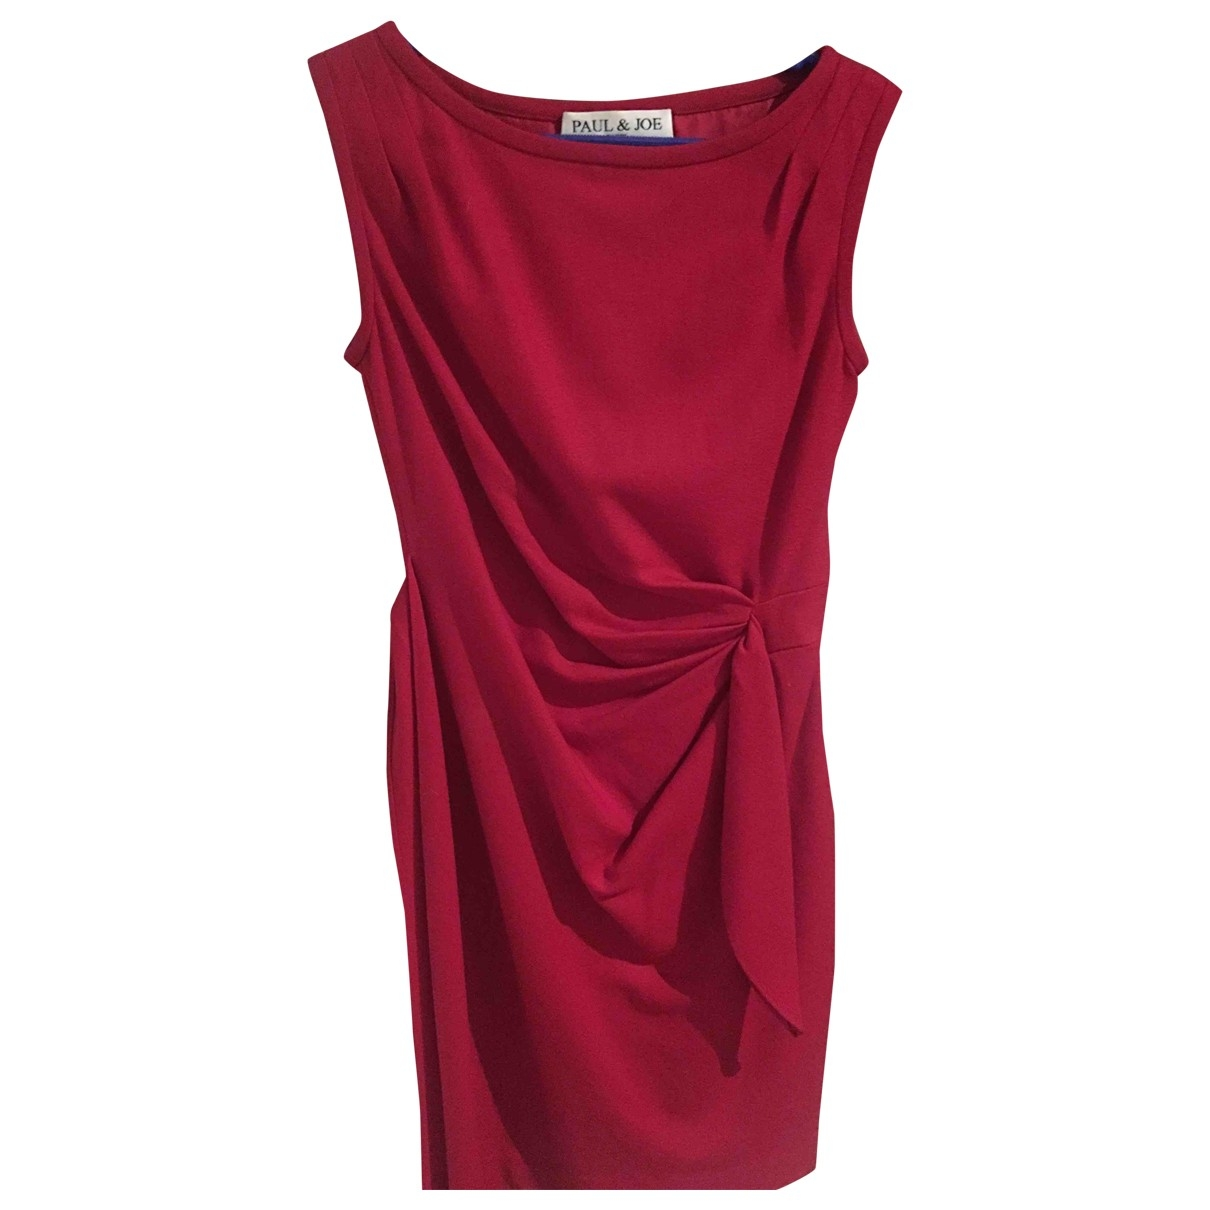 Paul & Joe - Robe   pour femme en coton - elasthane - rouge